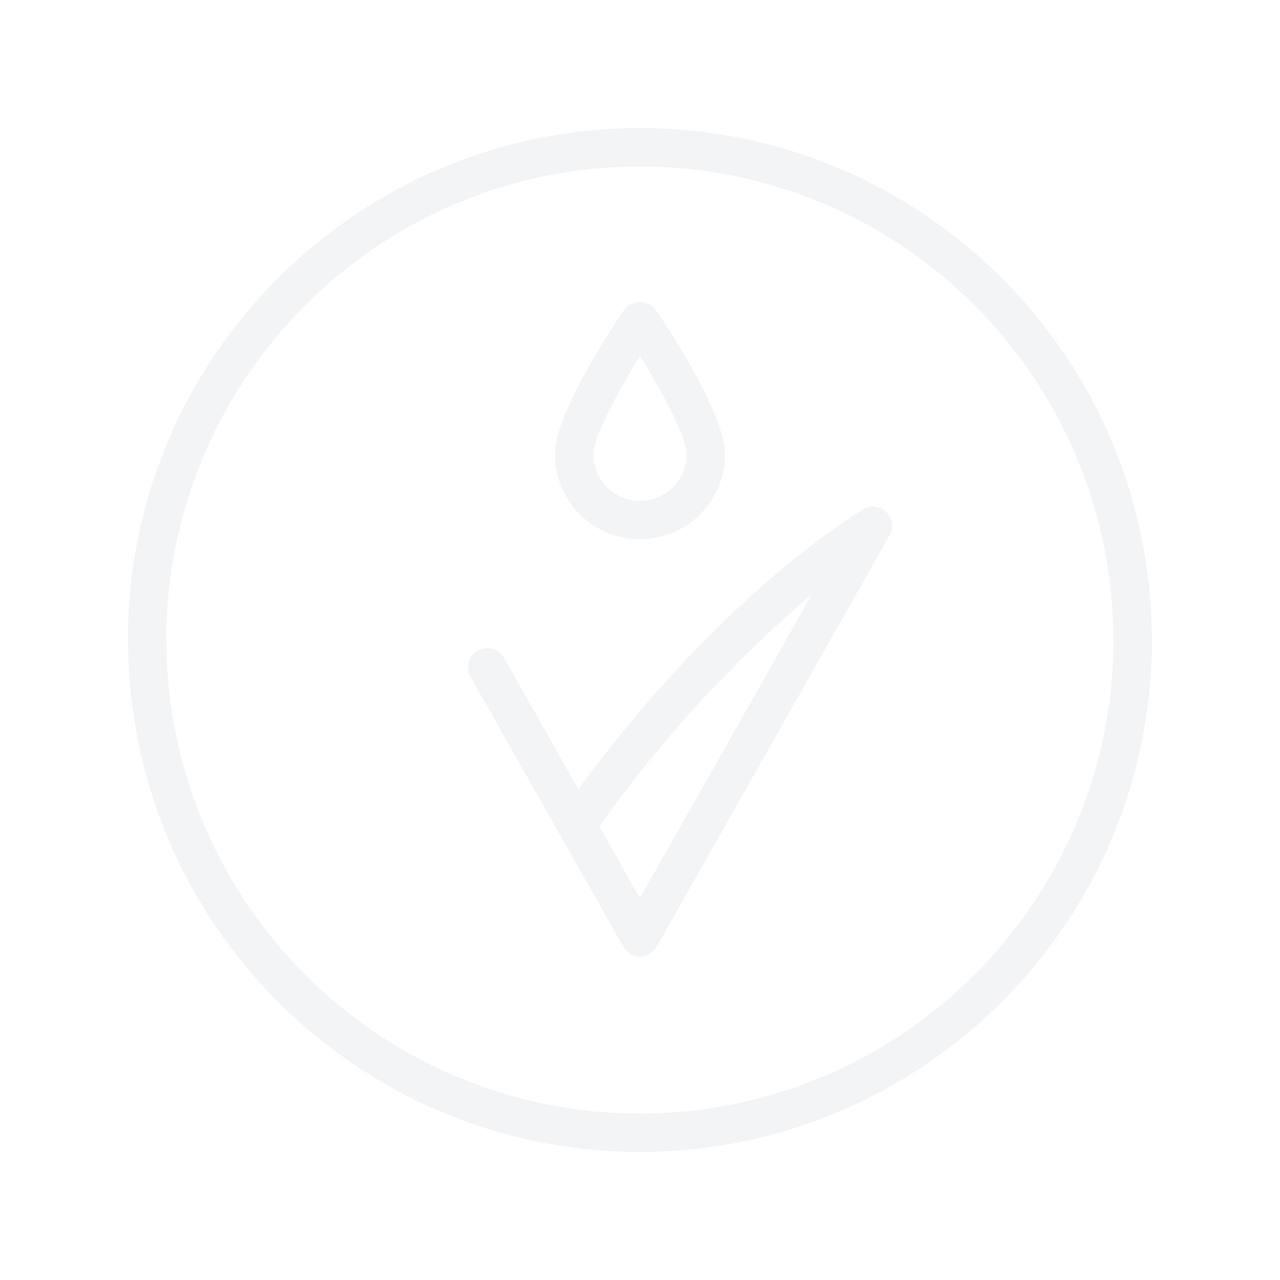 E.L.F. Beautifully Bare Cheeky Glow Soft Peach 10g